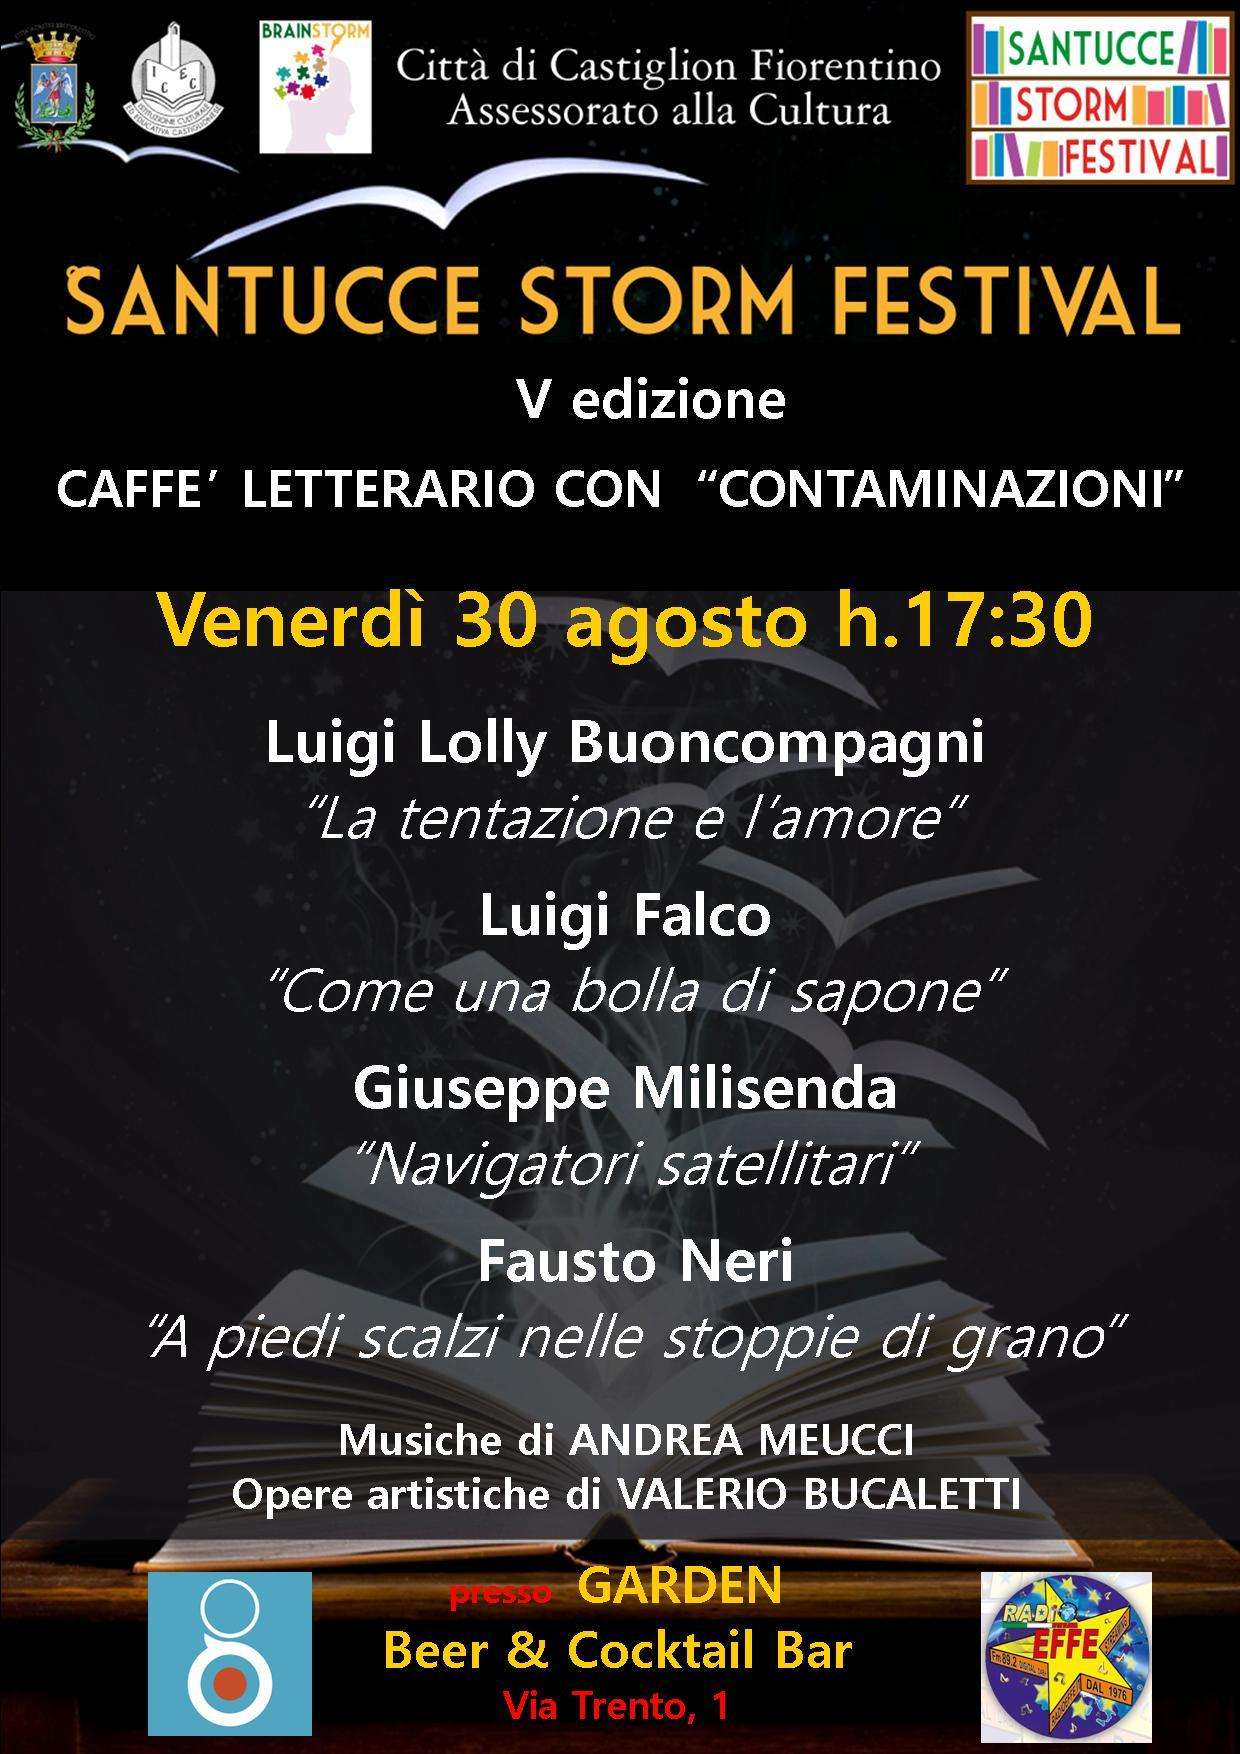 Santucce Storm Festival: venerdì 30 il terzo appuntamento